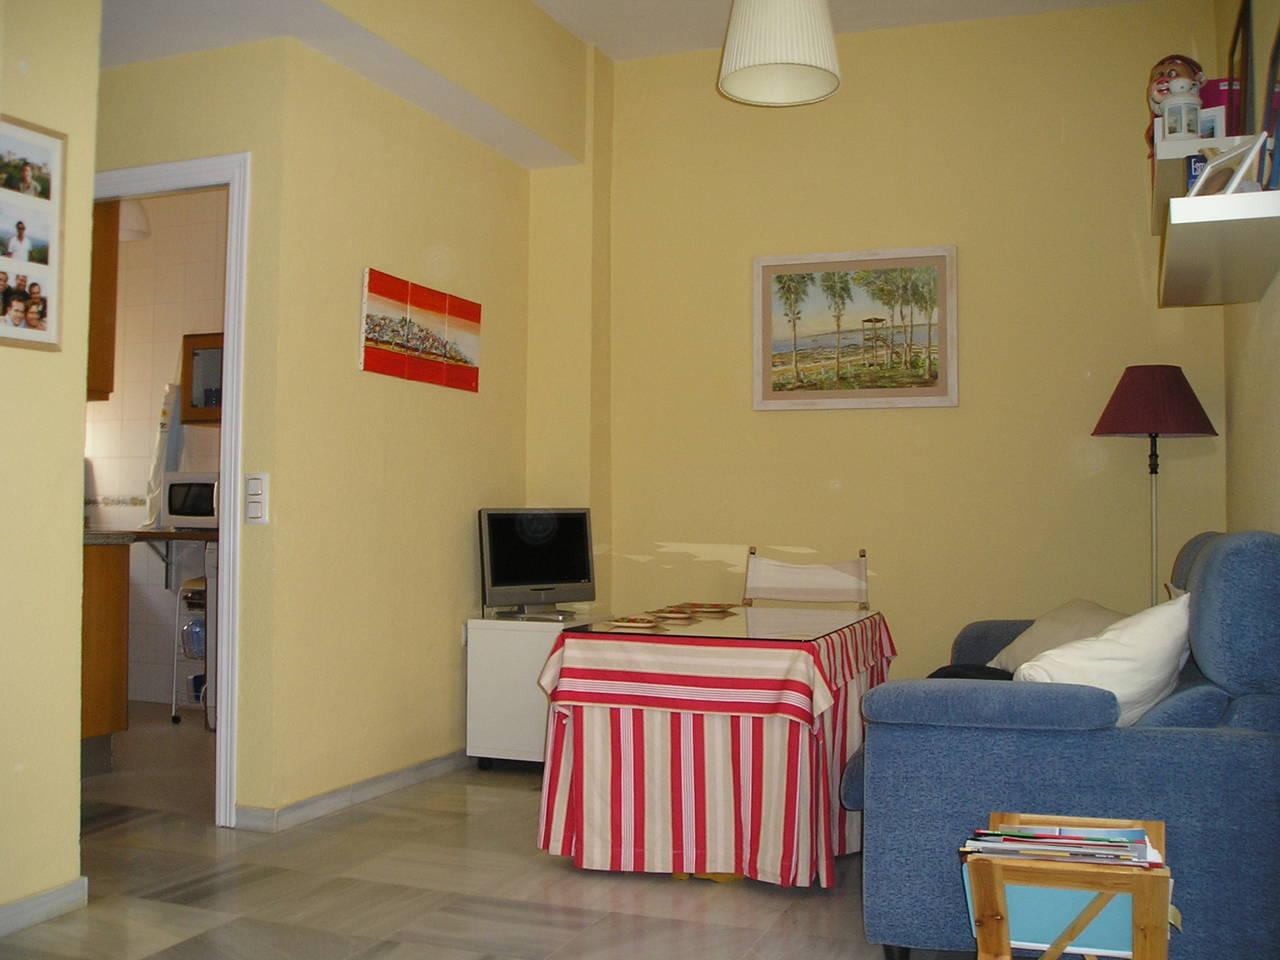 alquiler apartamento. Calle San Juan de Dios 17, 3º d. Sevilla  - Foto 4